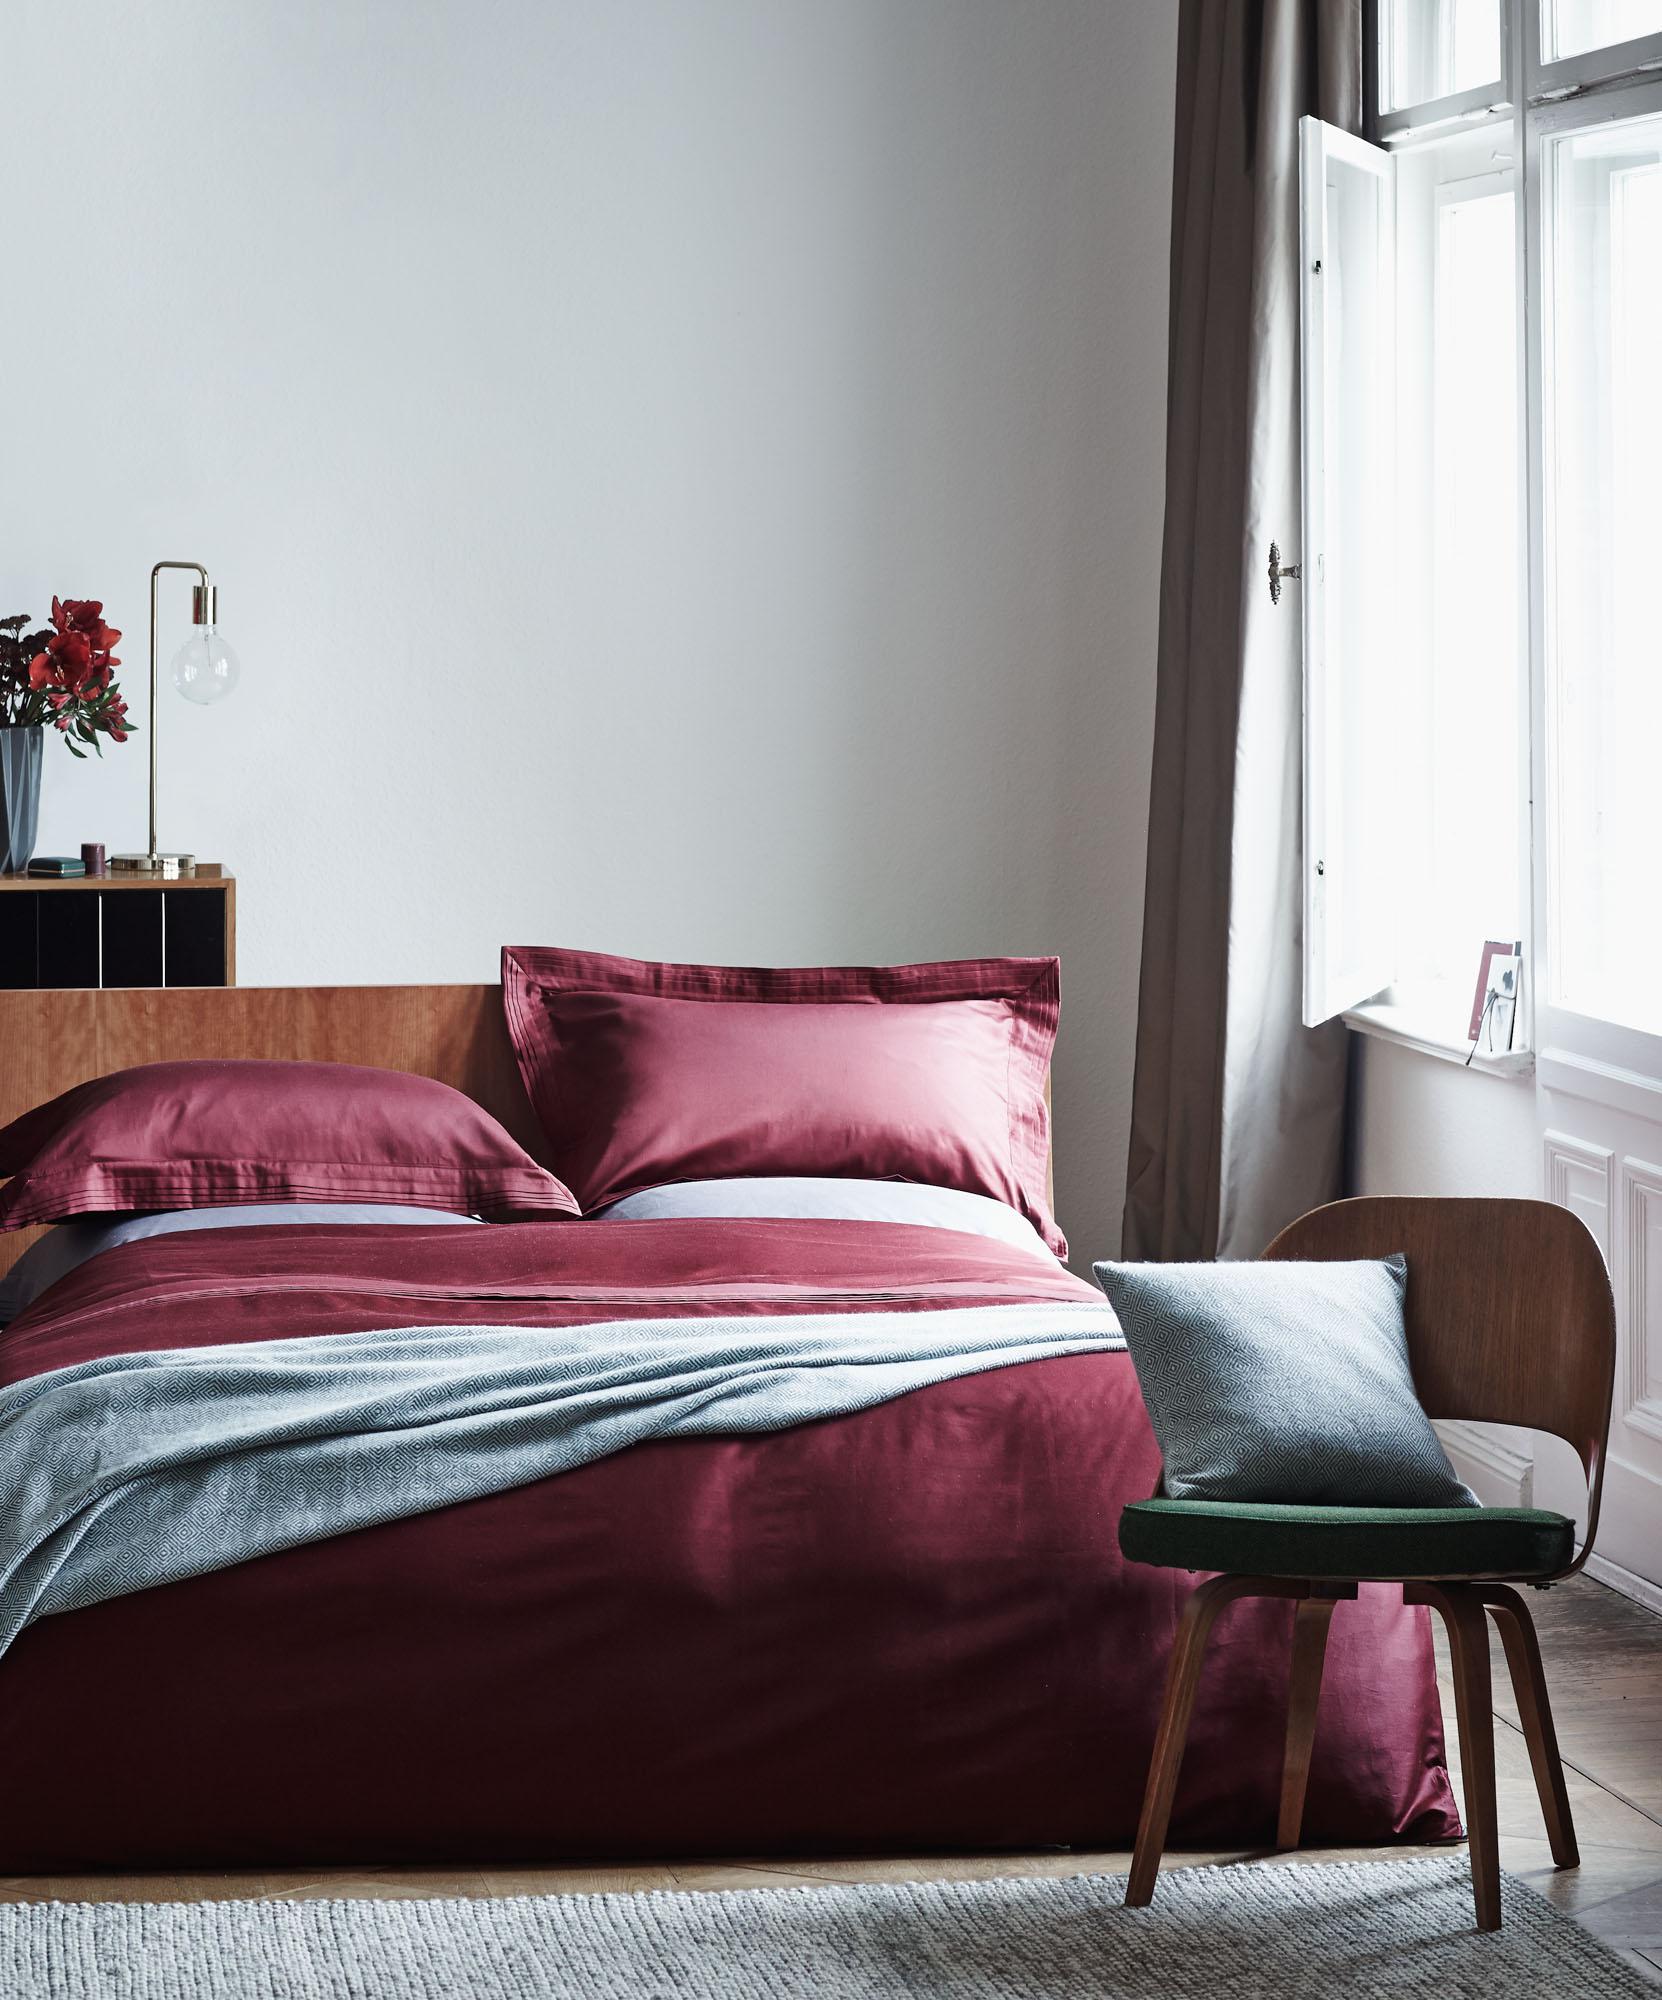 Bedroom manziana cover white 26.09.14 0321_RGB.jpg